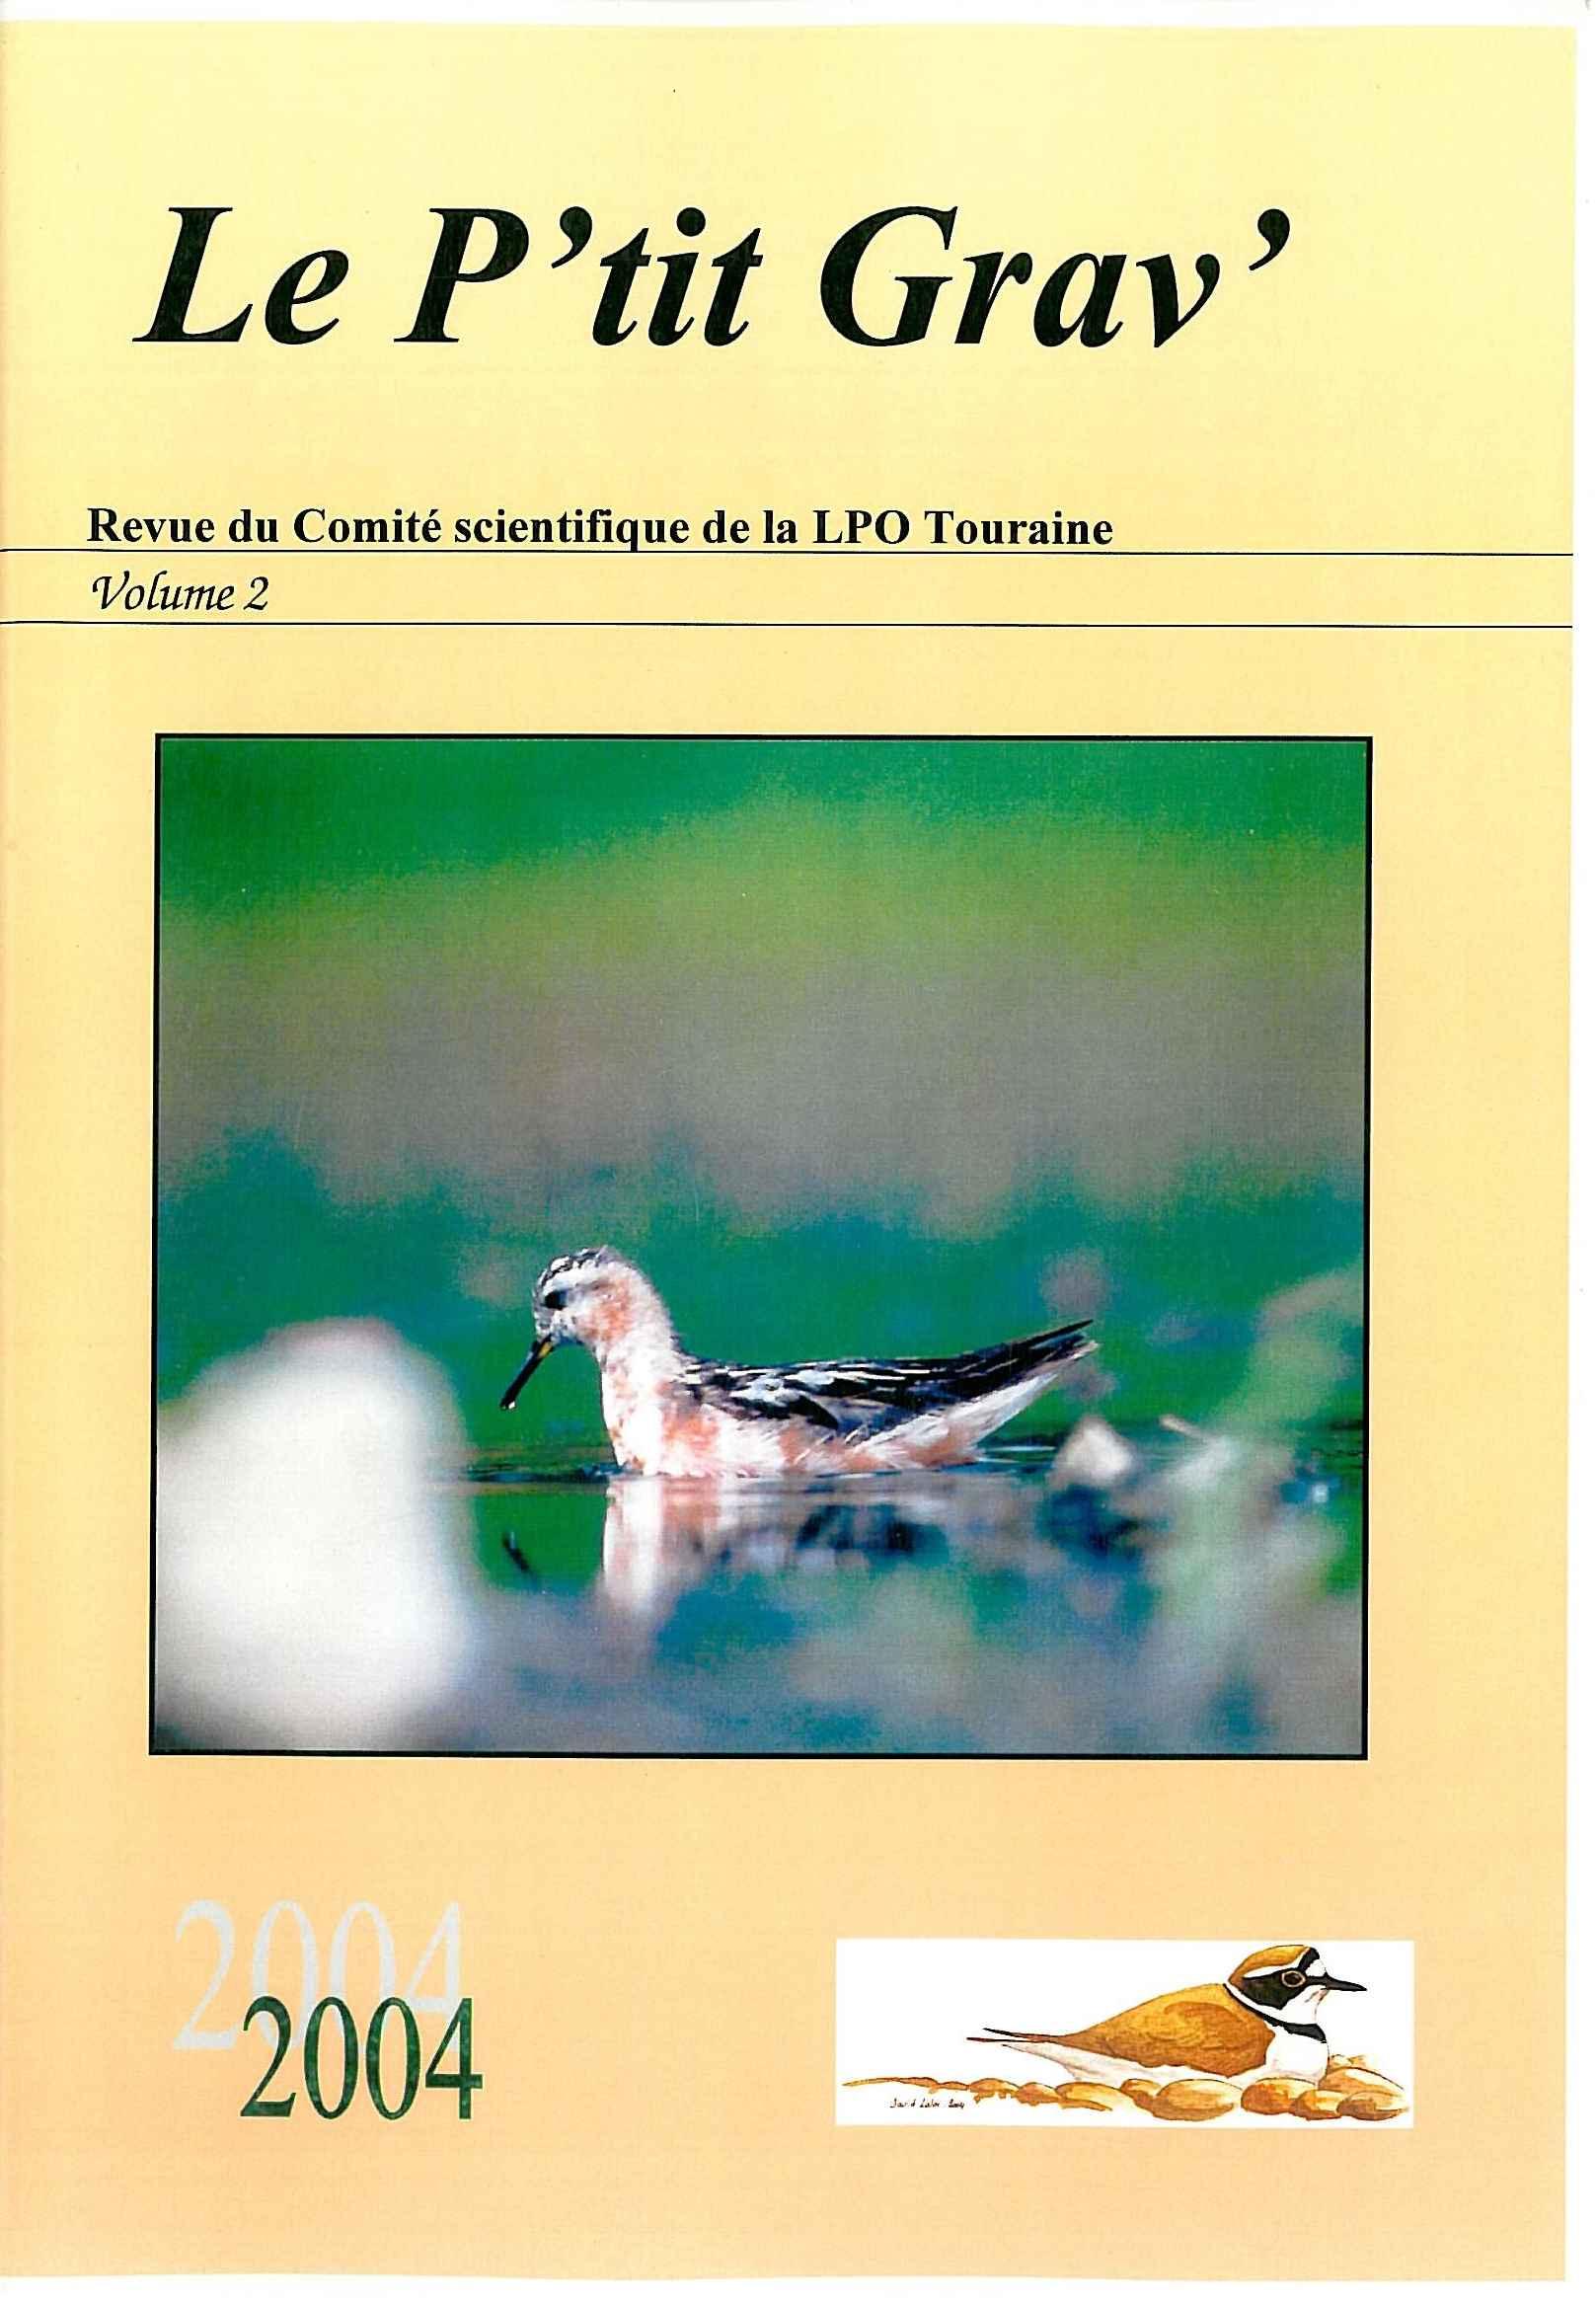 http://files.biolovision.net/www.faune-touraine.org/userfiles/MonDossier/PtitGravvol2.jpg